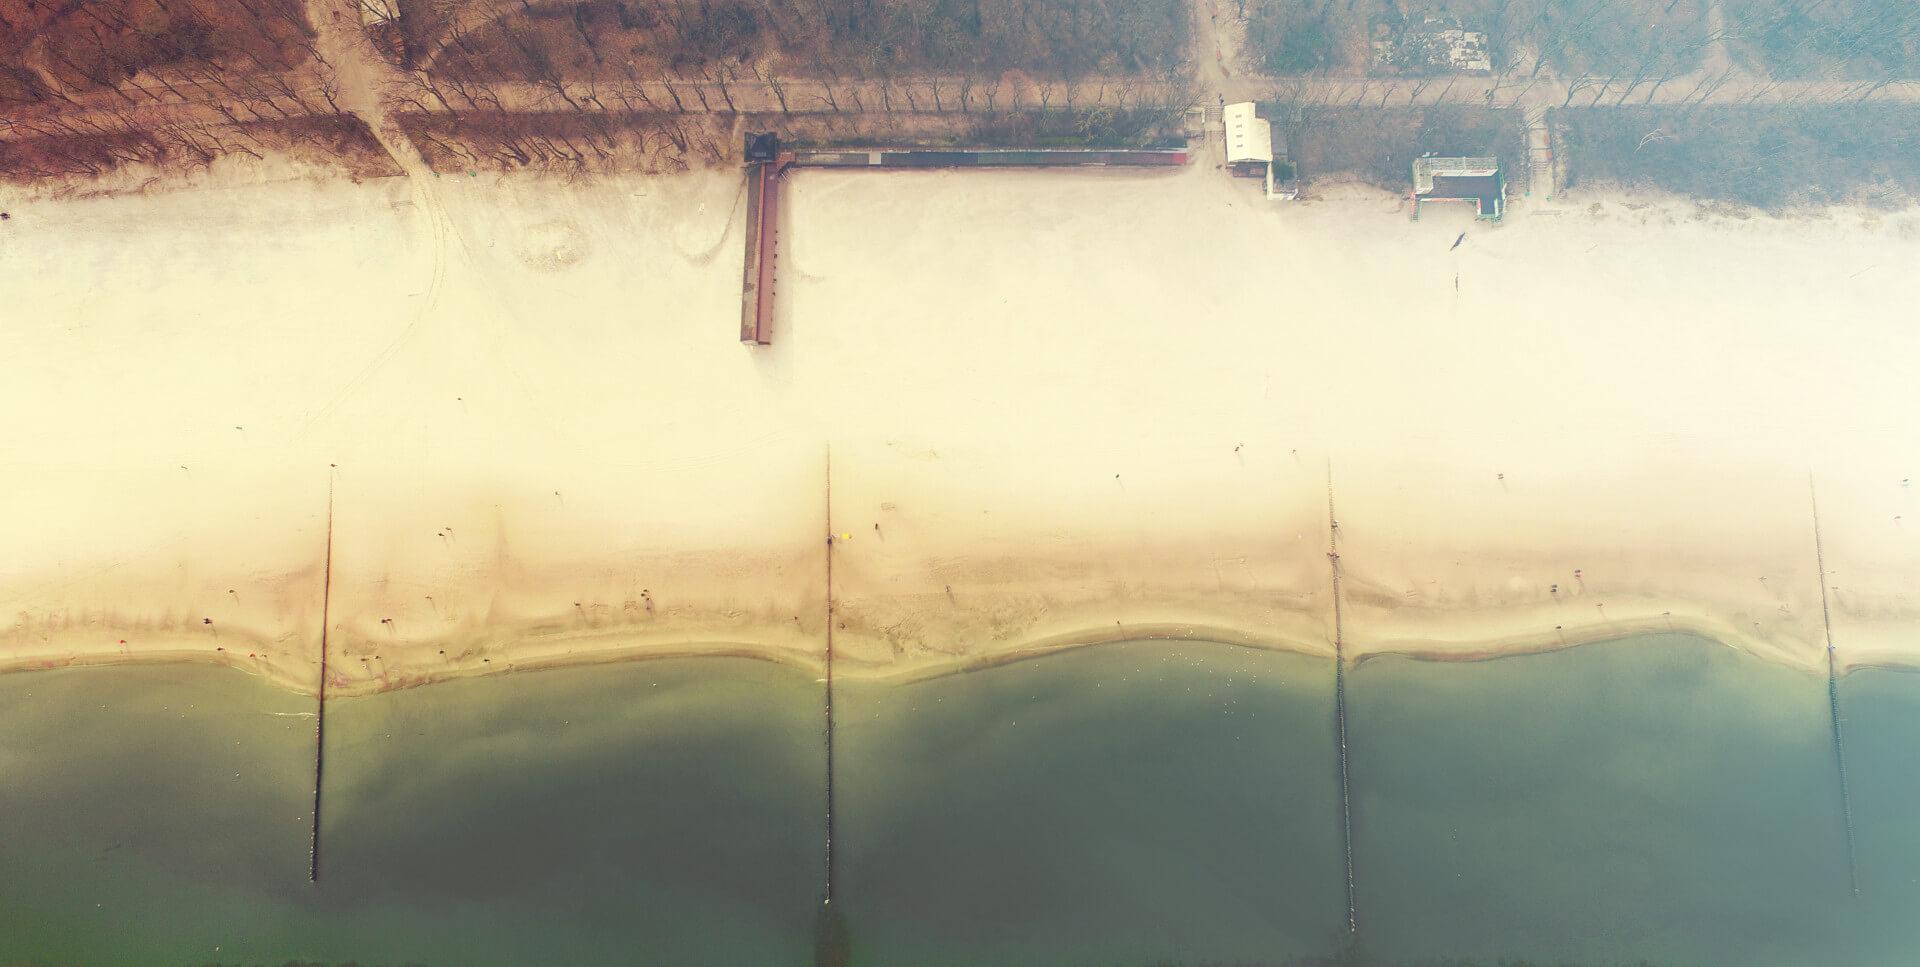 Morskie Oko – luksusowy widok na morze